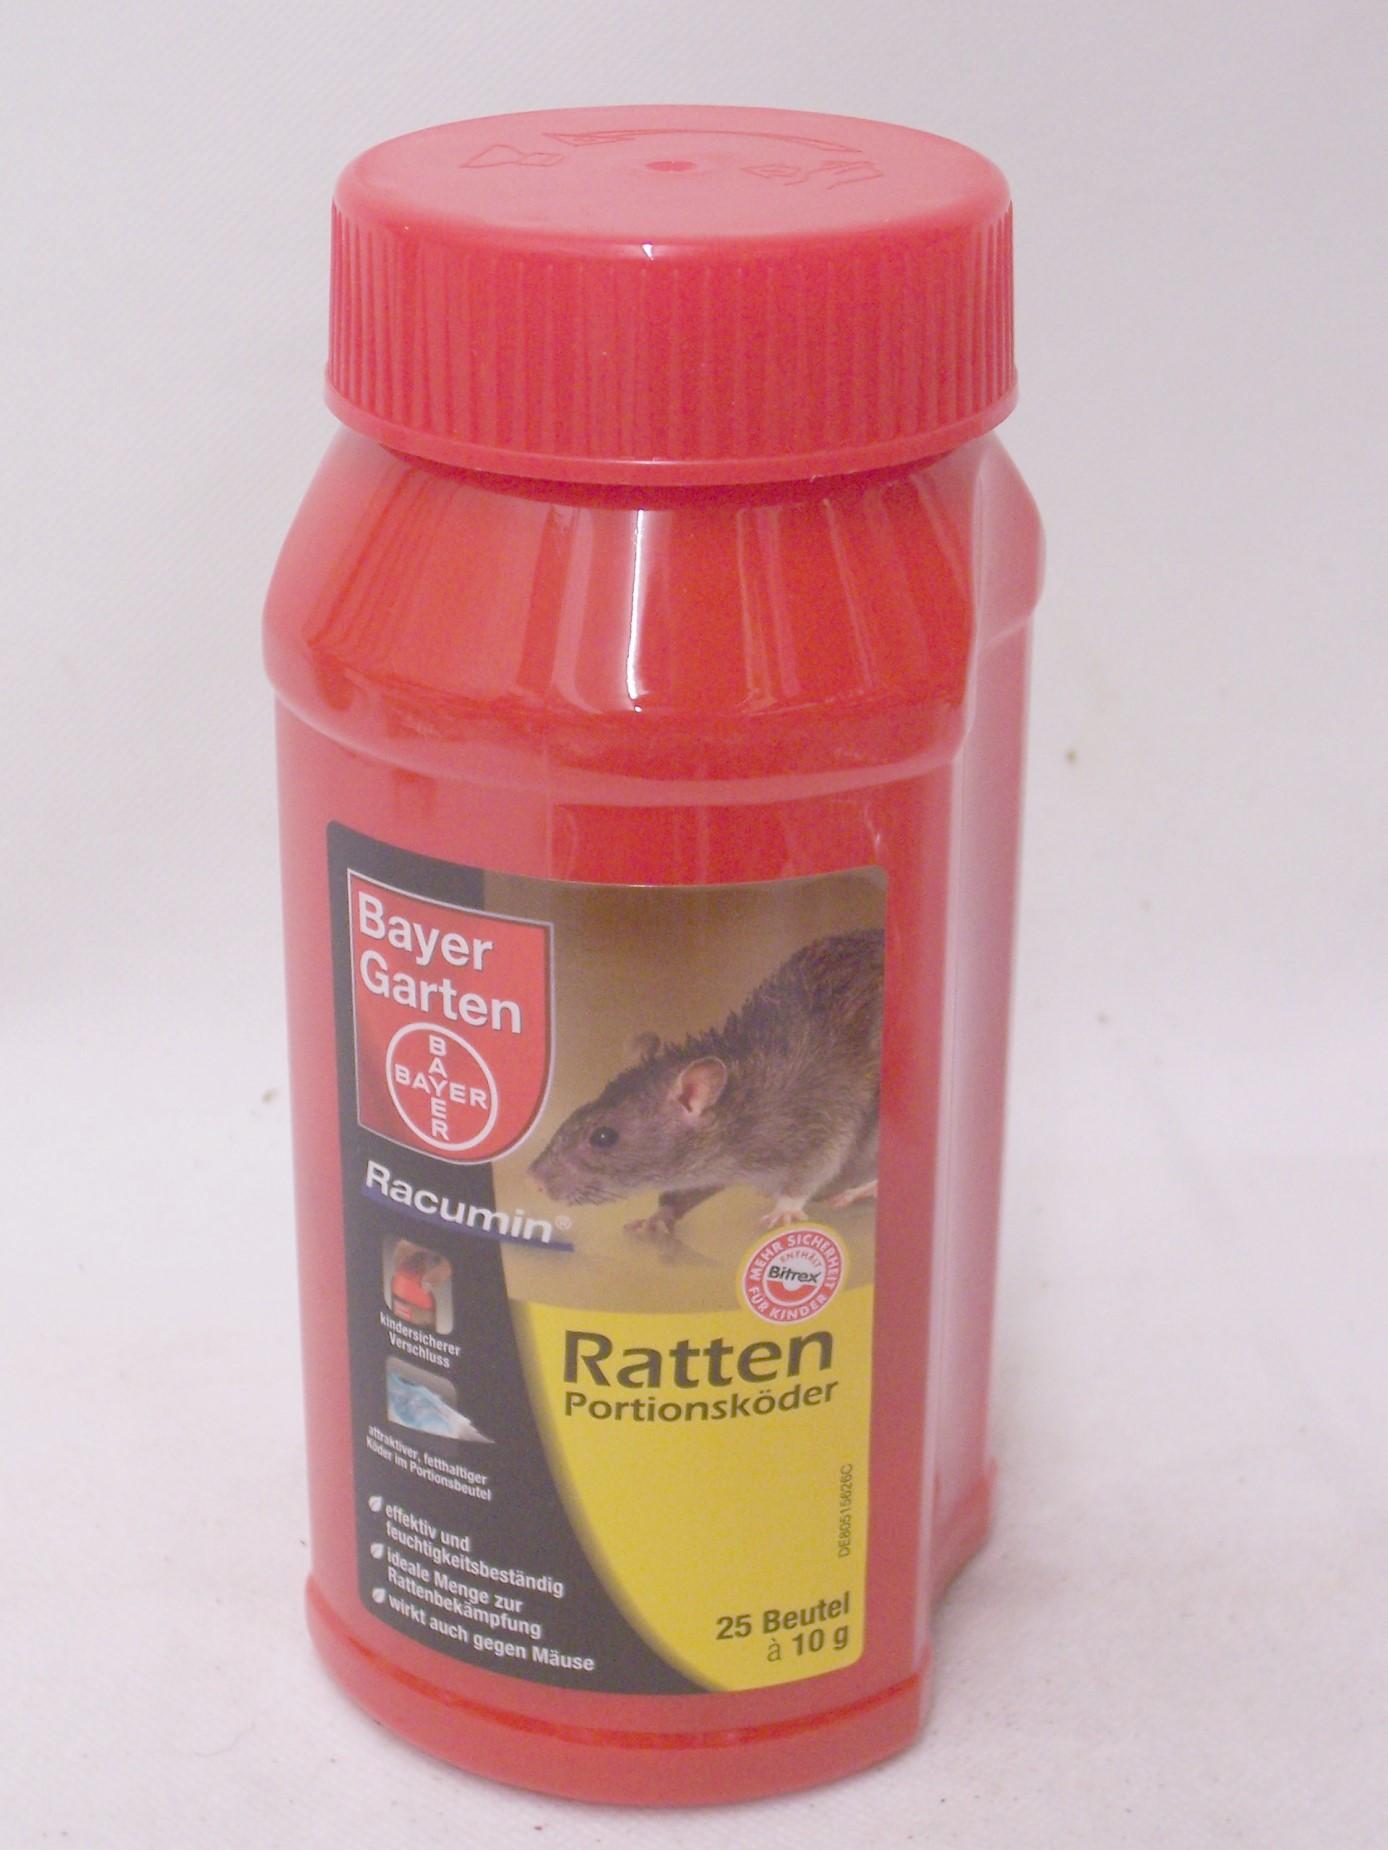 ratten 25 portionsk der racumin bayer garten rattengift auch m usegift ebay. Black Bedroom Furniture Sets. Home Design Ideas